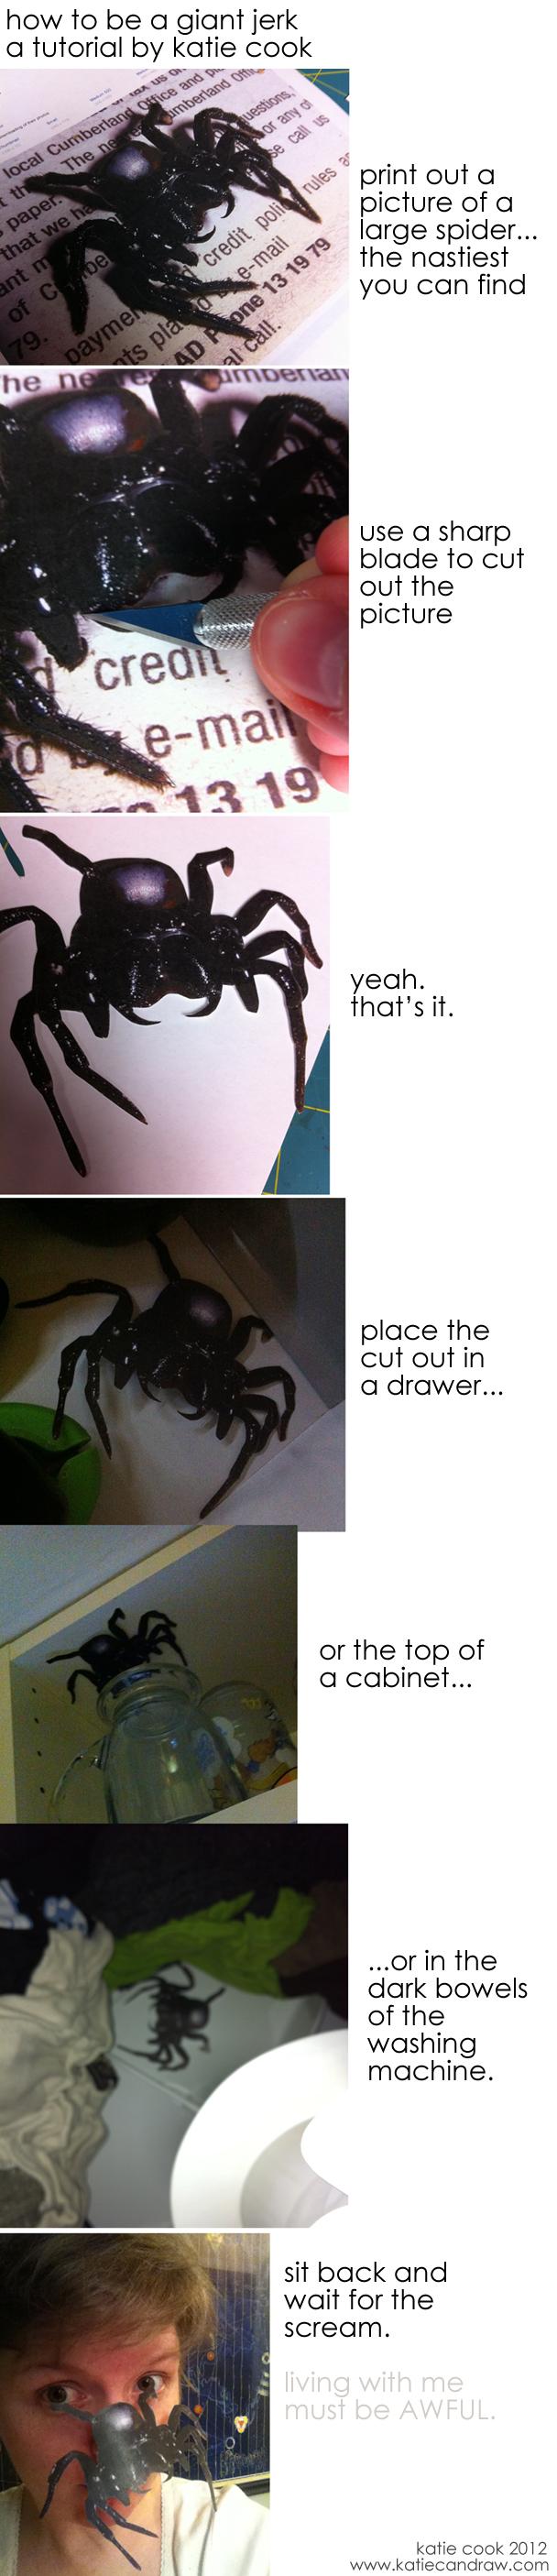 Spider-troll